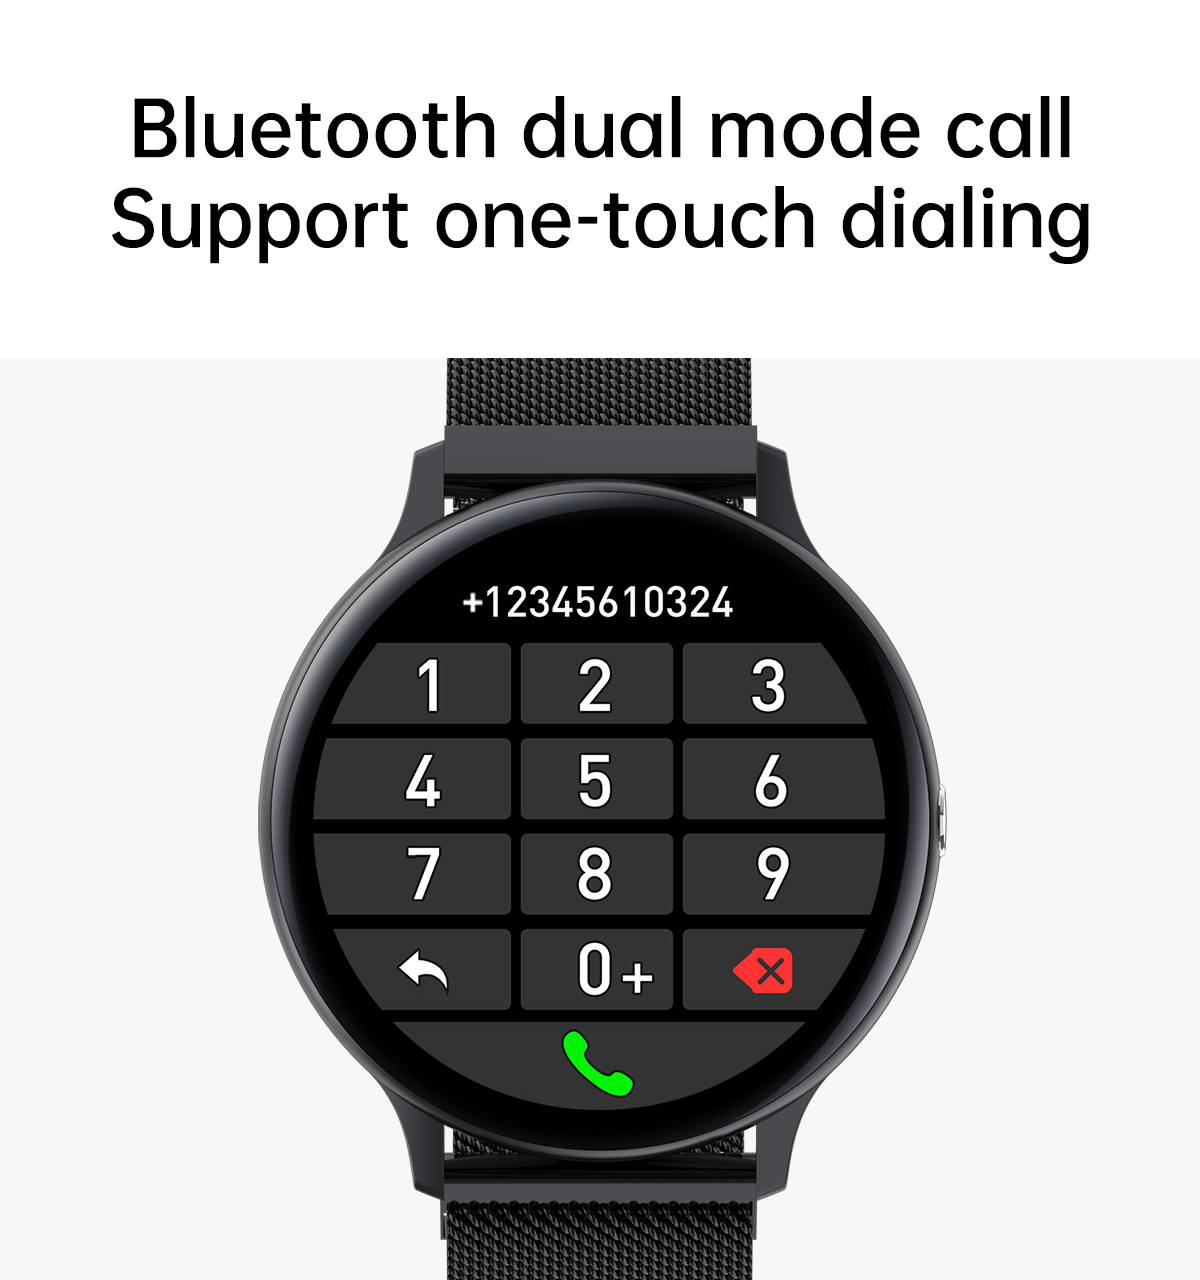 H33bd7db3ec85424e94ac8bb4fe2590f0K LIGE 2021 Bluetooth Answer Call Smart Watch Men Full Touch Dial Call Fitness Tracker IP67 Waterproof 4G ROM Smartwatch for women